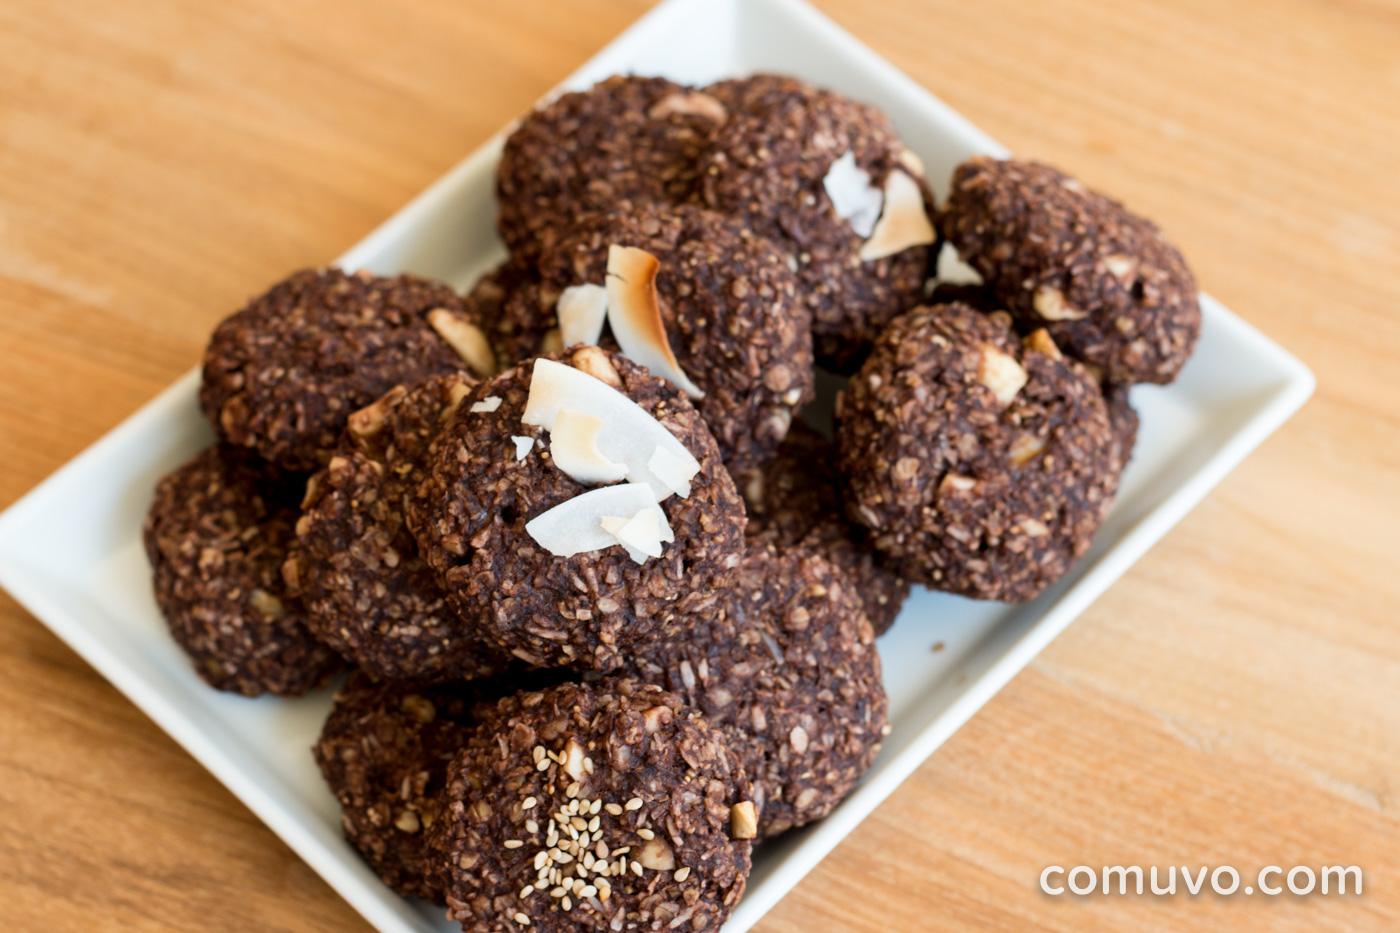 Vegane Kekse ohne Zucker |comuvo